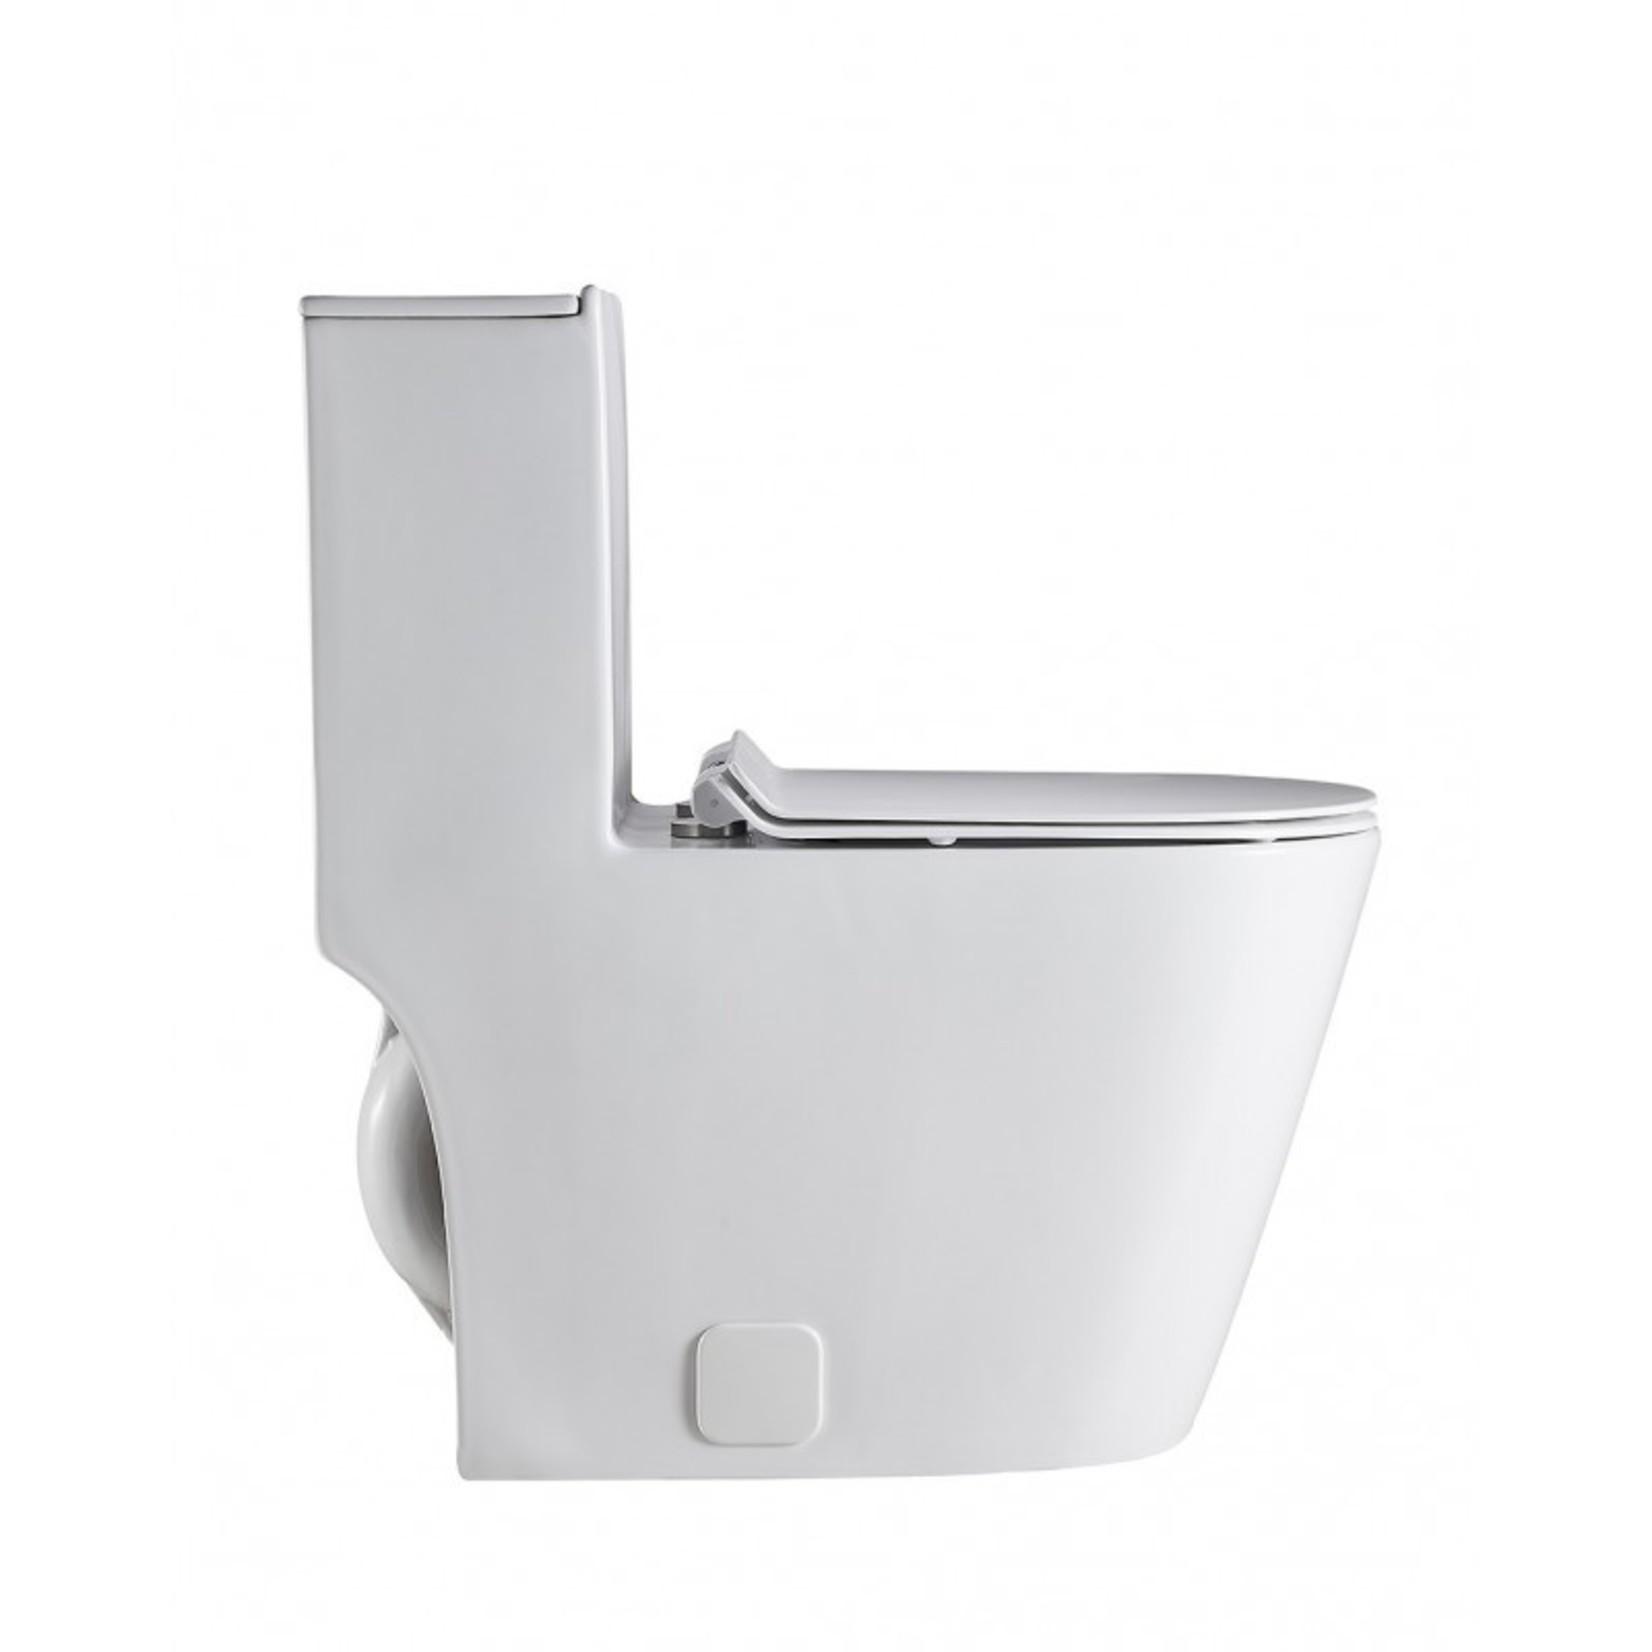 Toilette monopièce DI-012